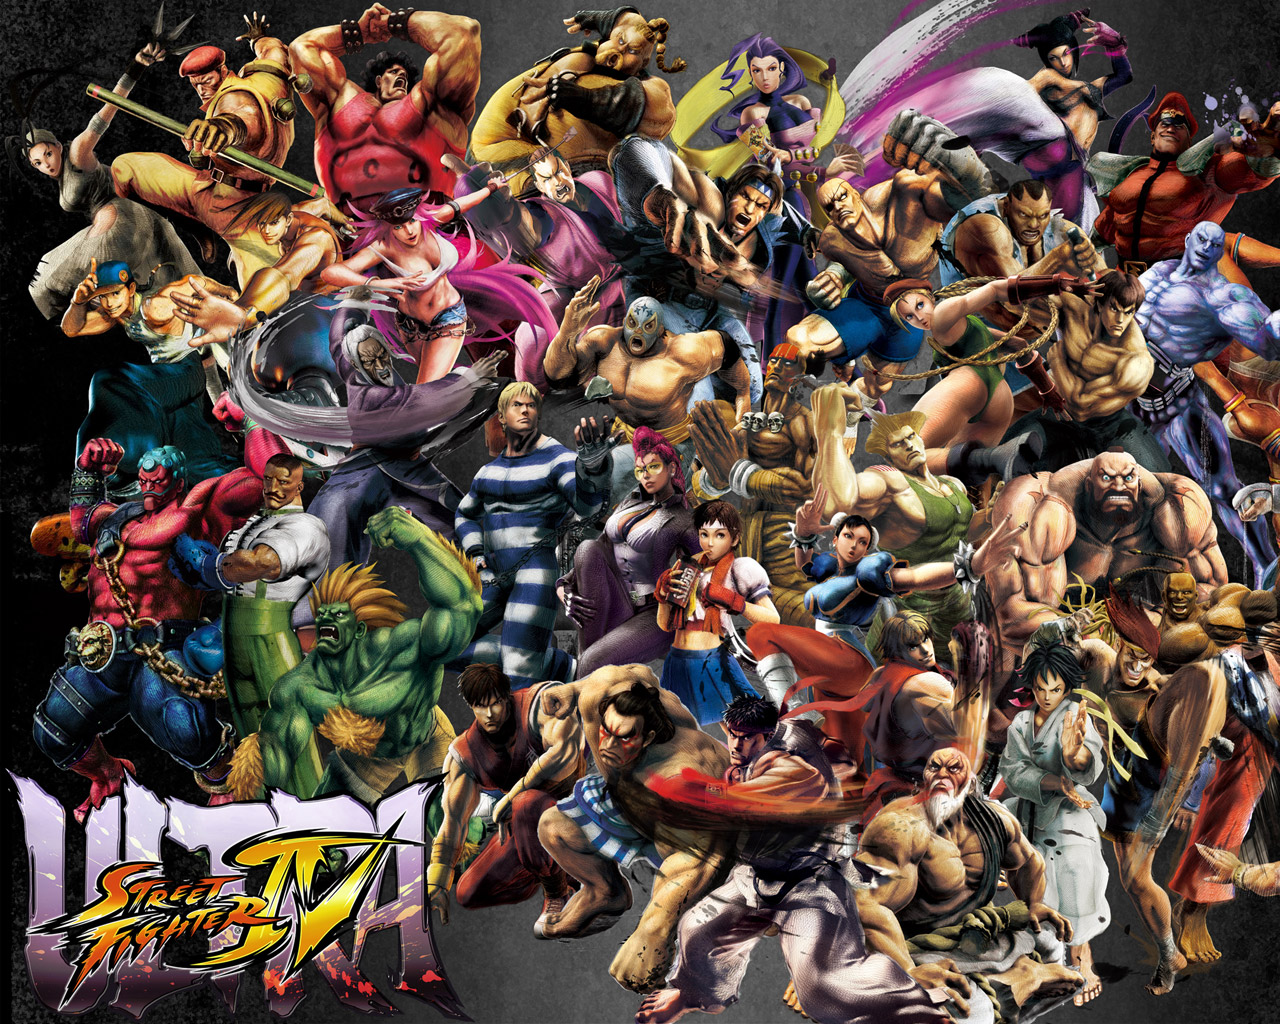 Ultra Street Fighter IV Wallpaper in 1280x1024